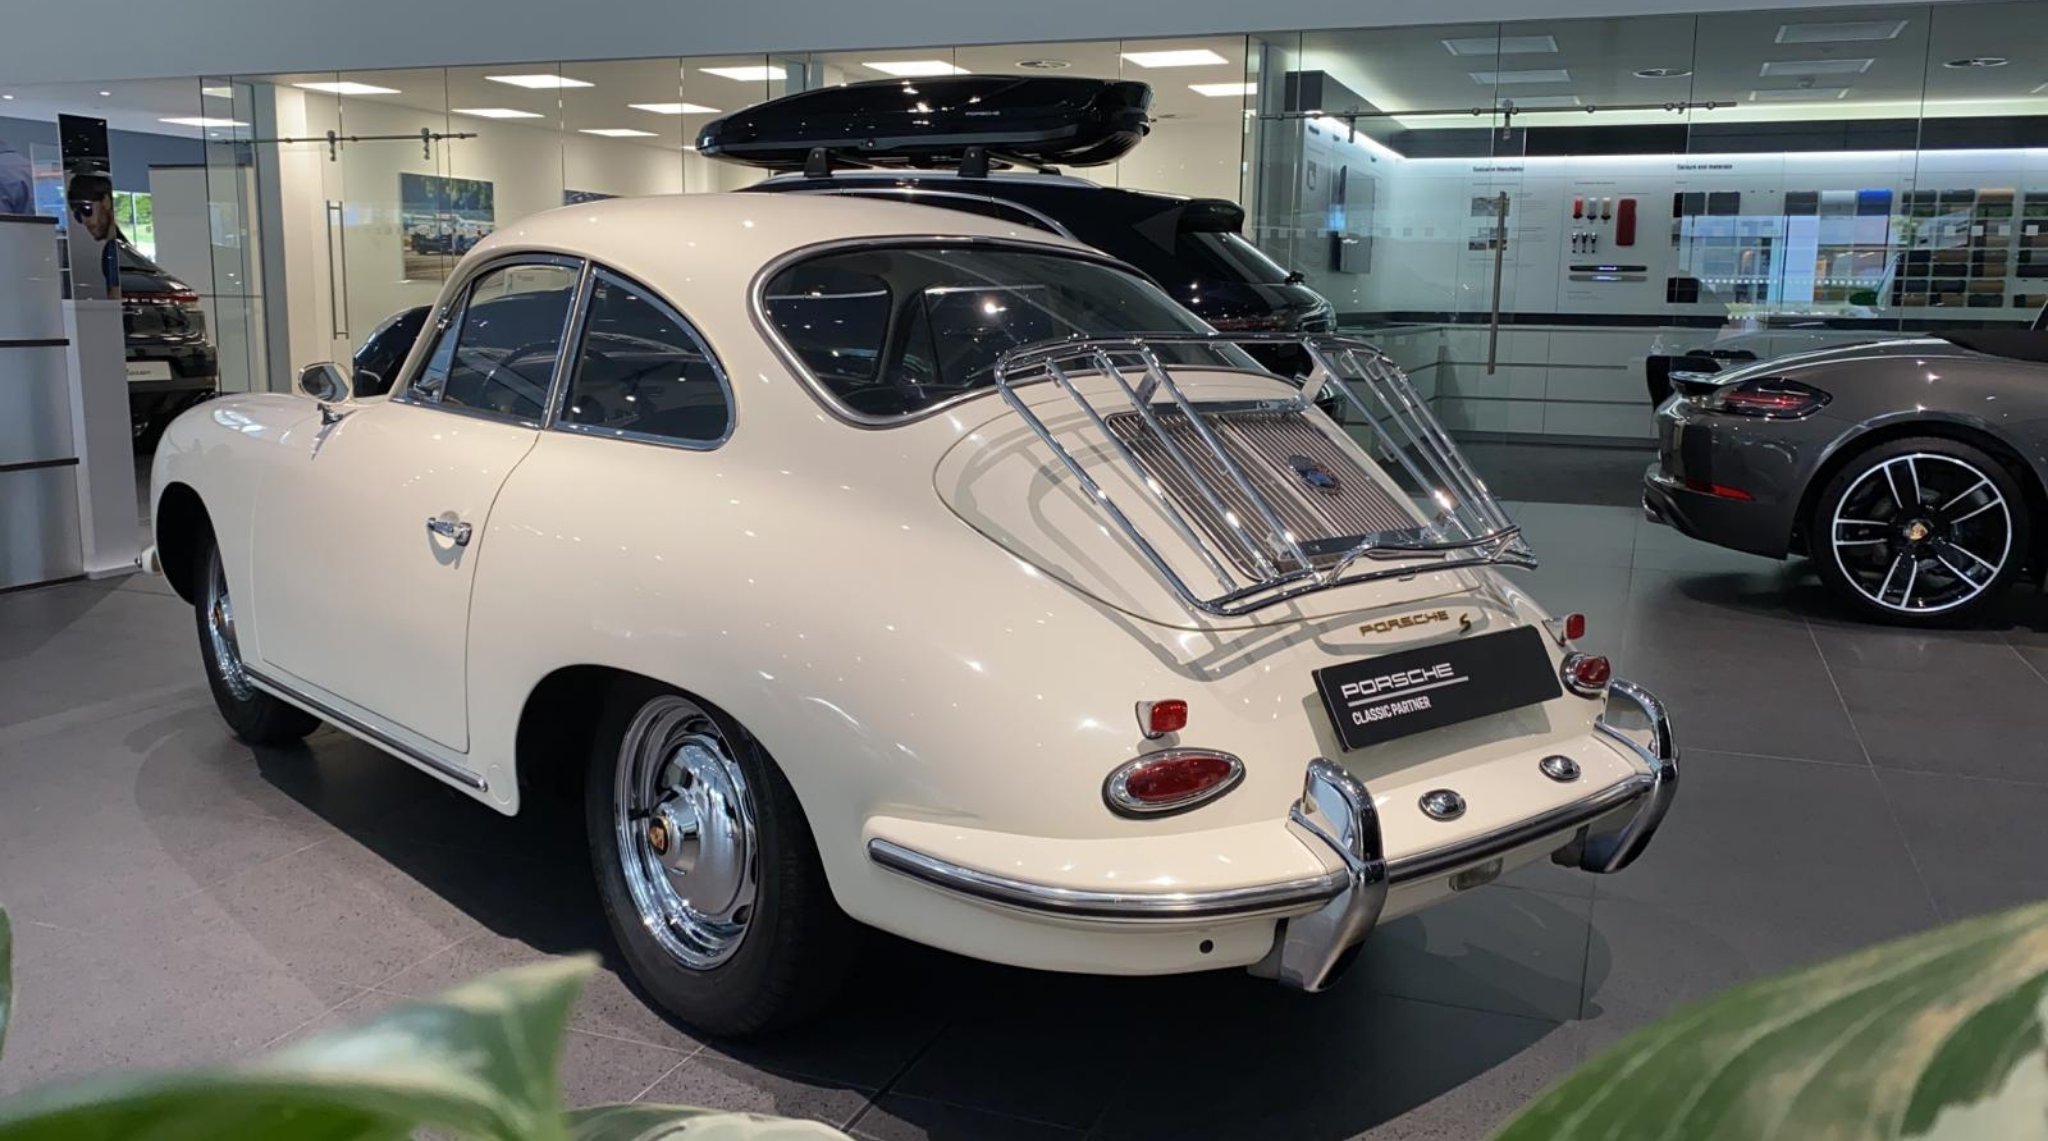 Porsche 356 Classic Restoration.png 2